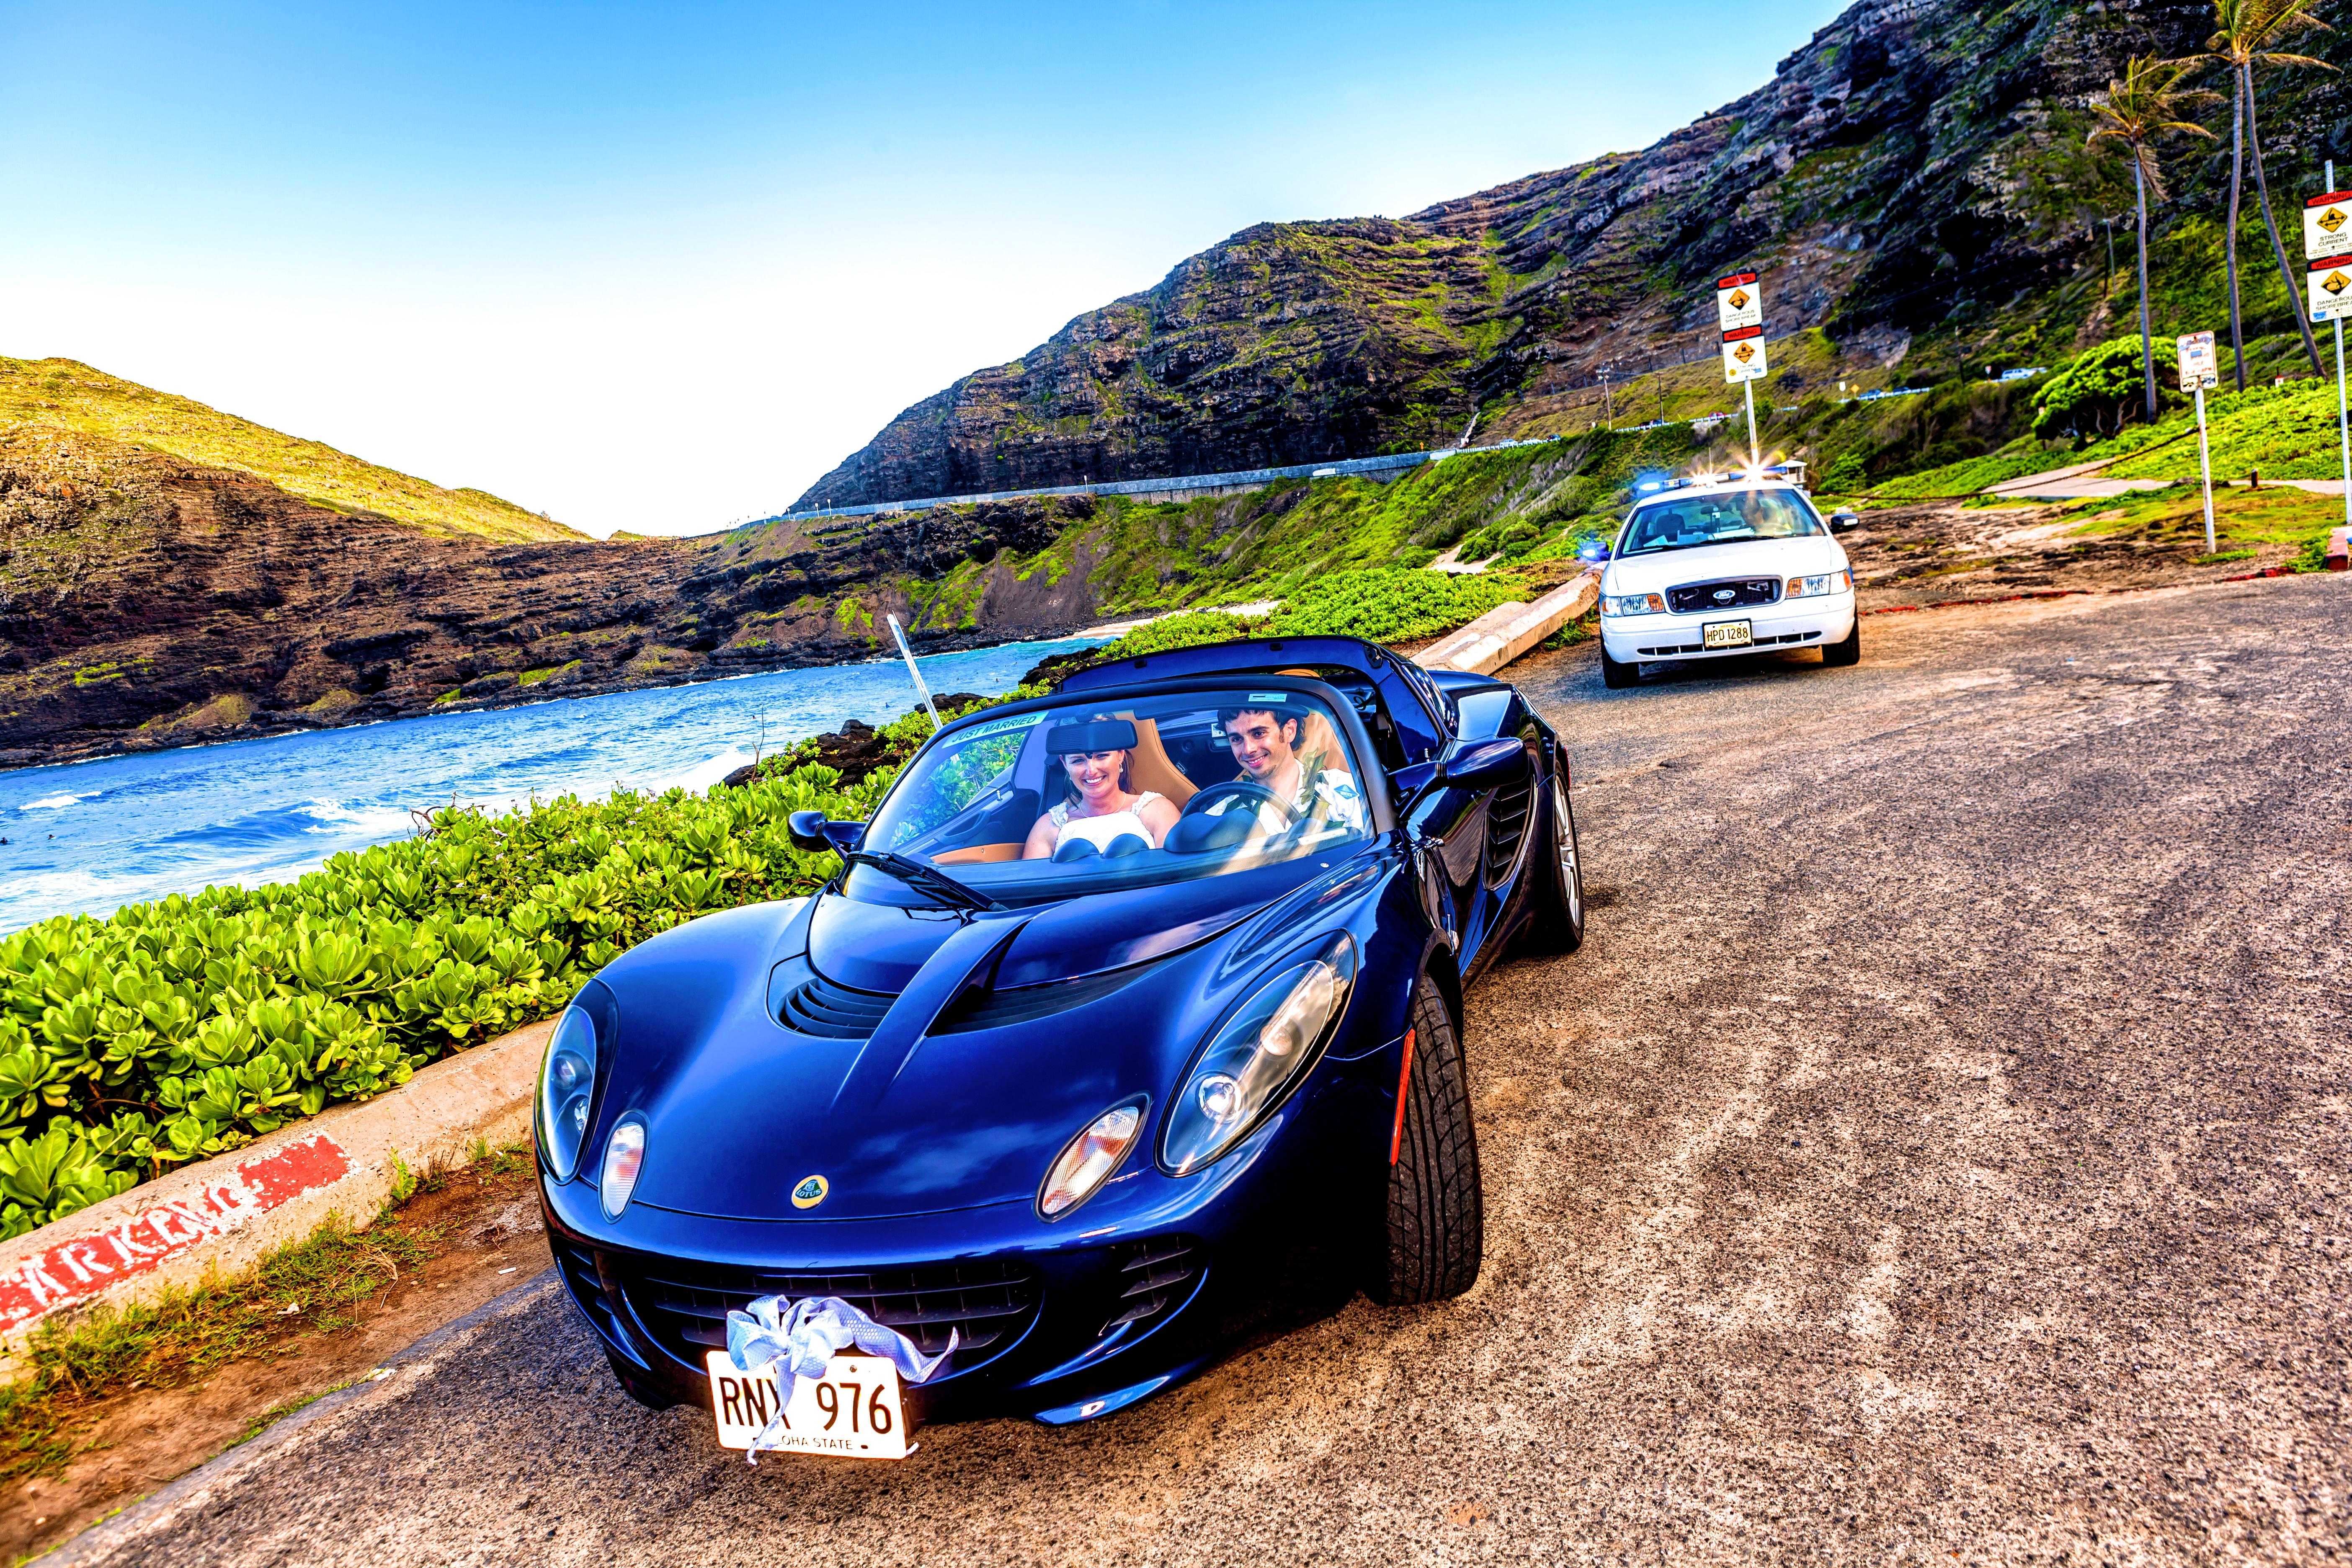 alohaislandweddings- Lotus car -6